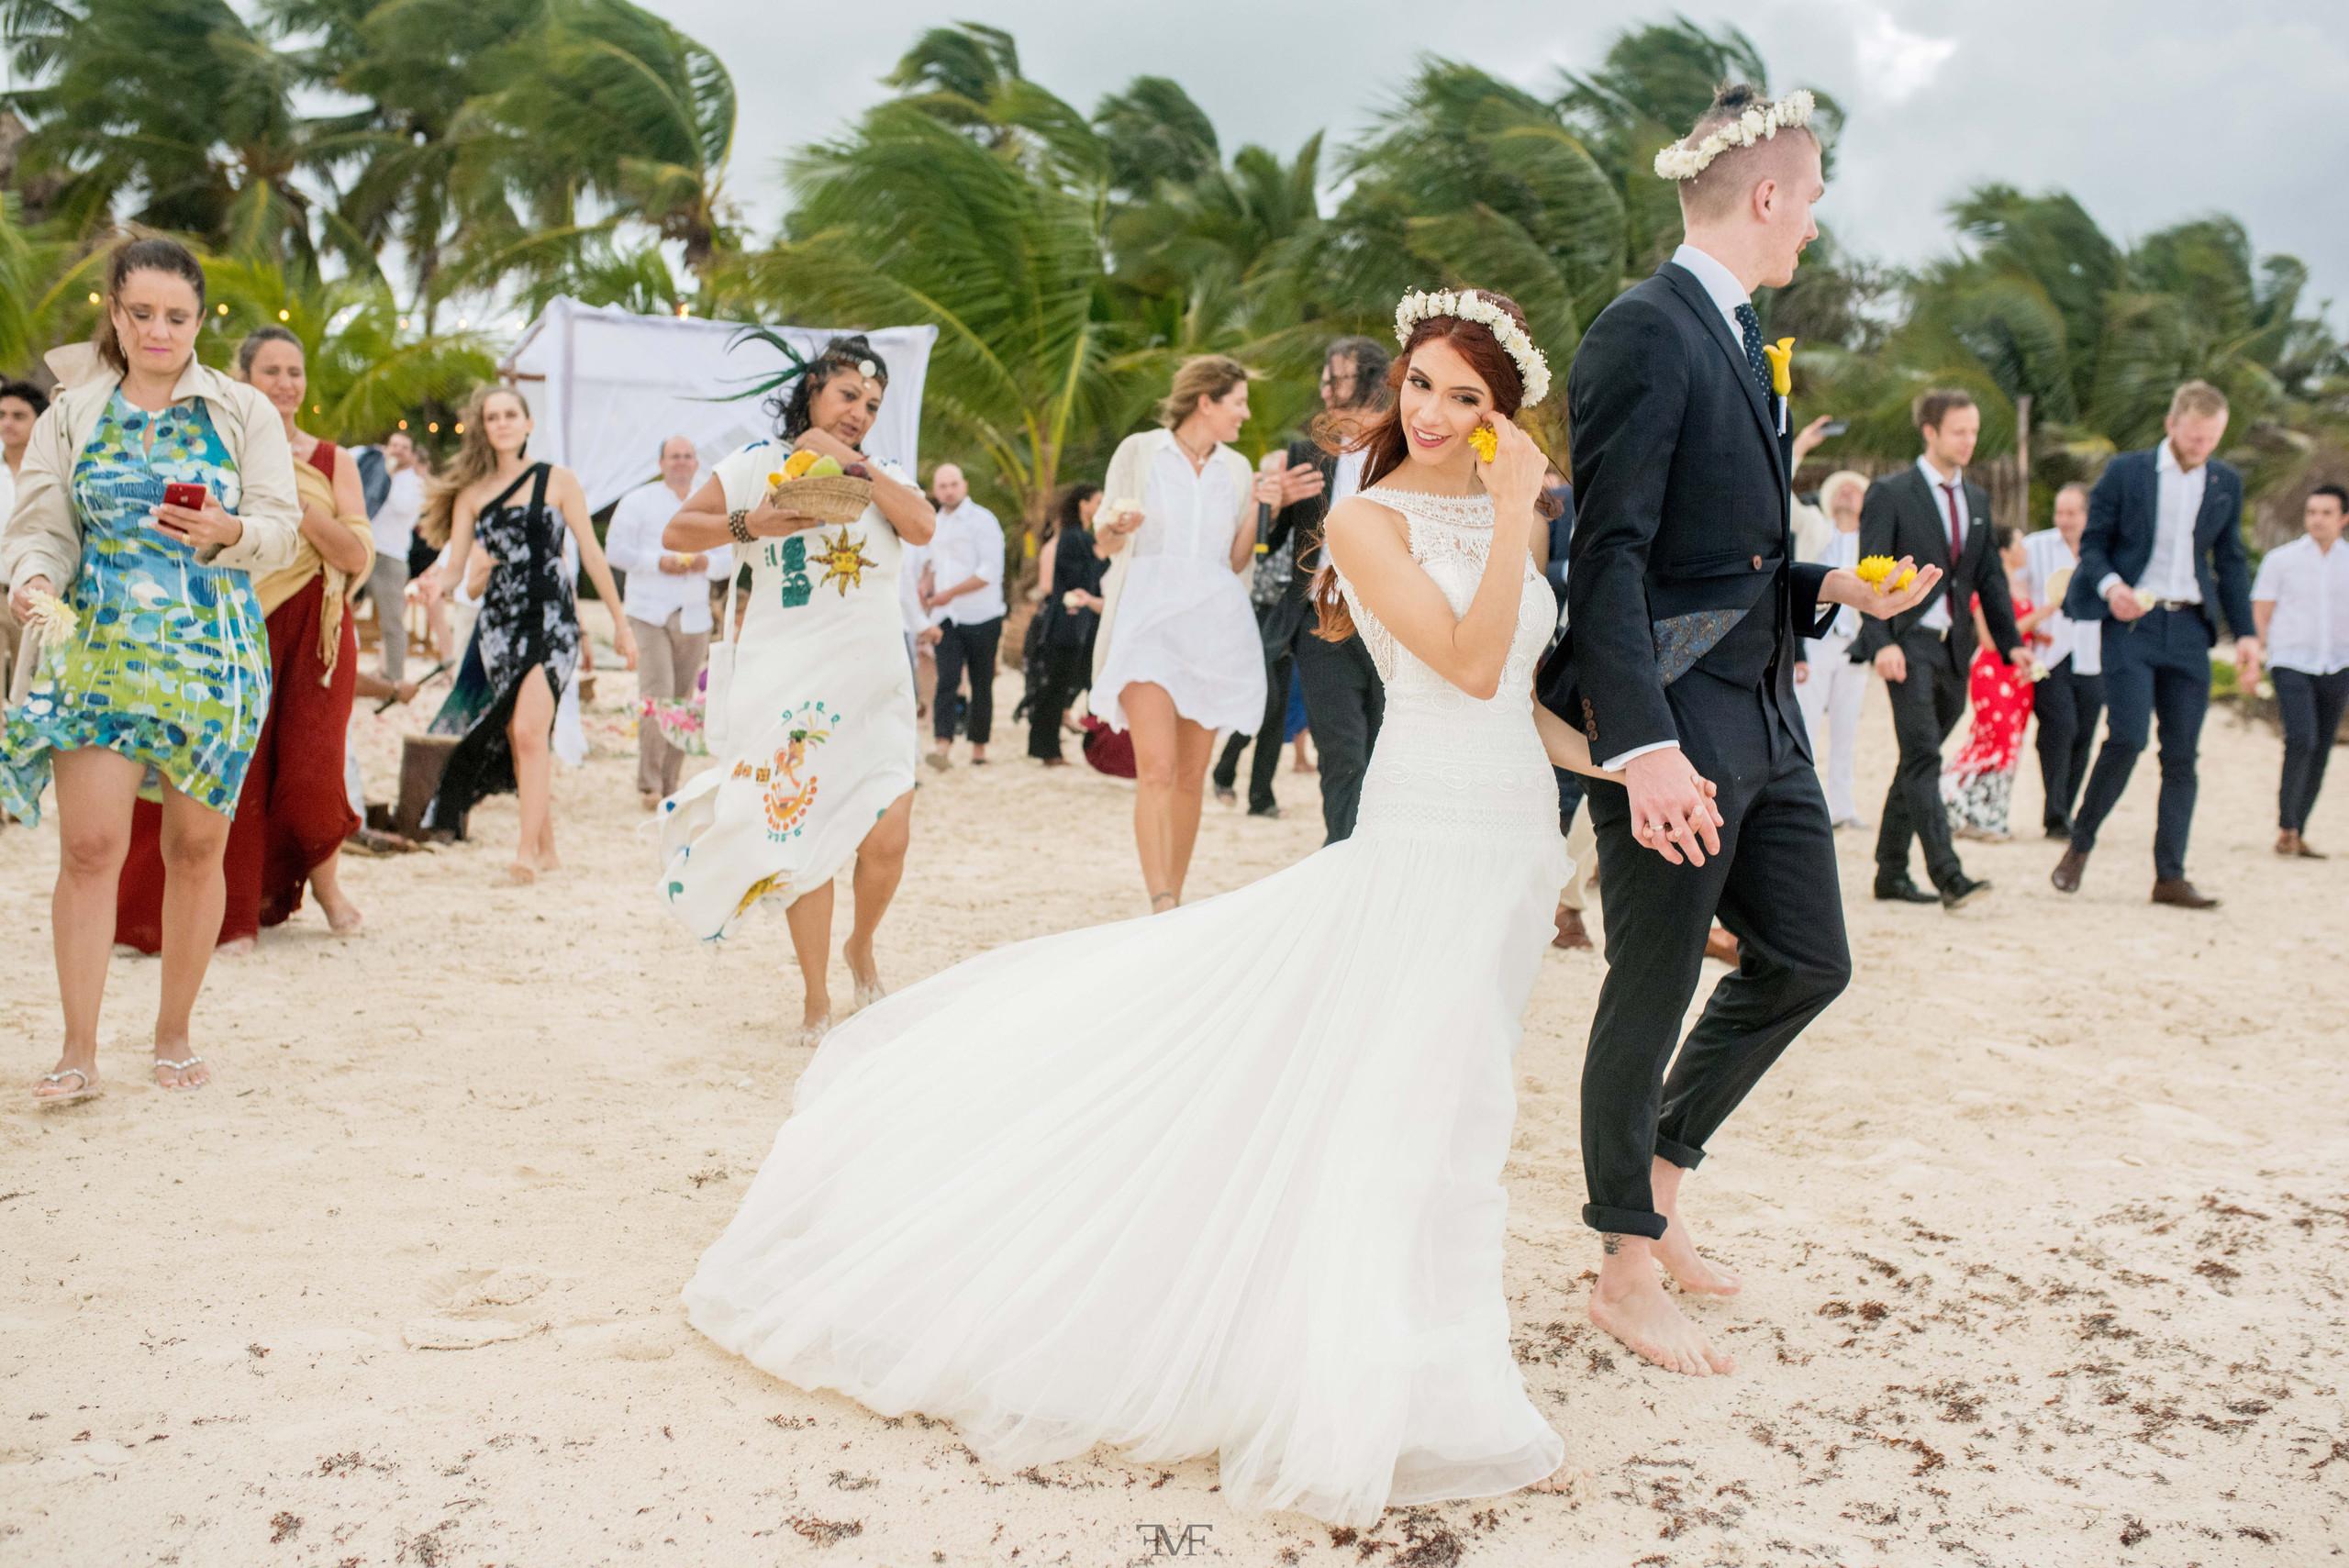 Fotografia de bodas en Tulum, @akiinbeach